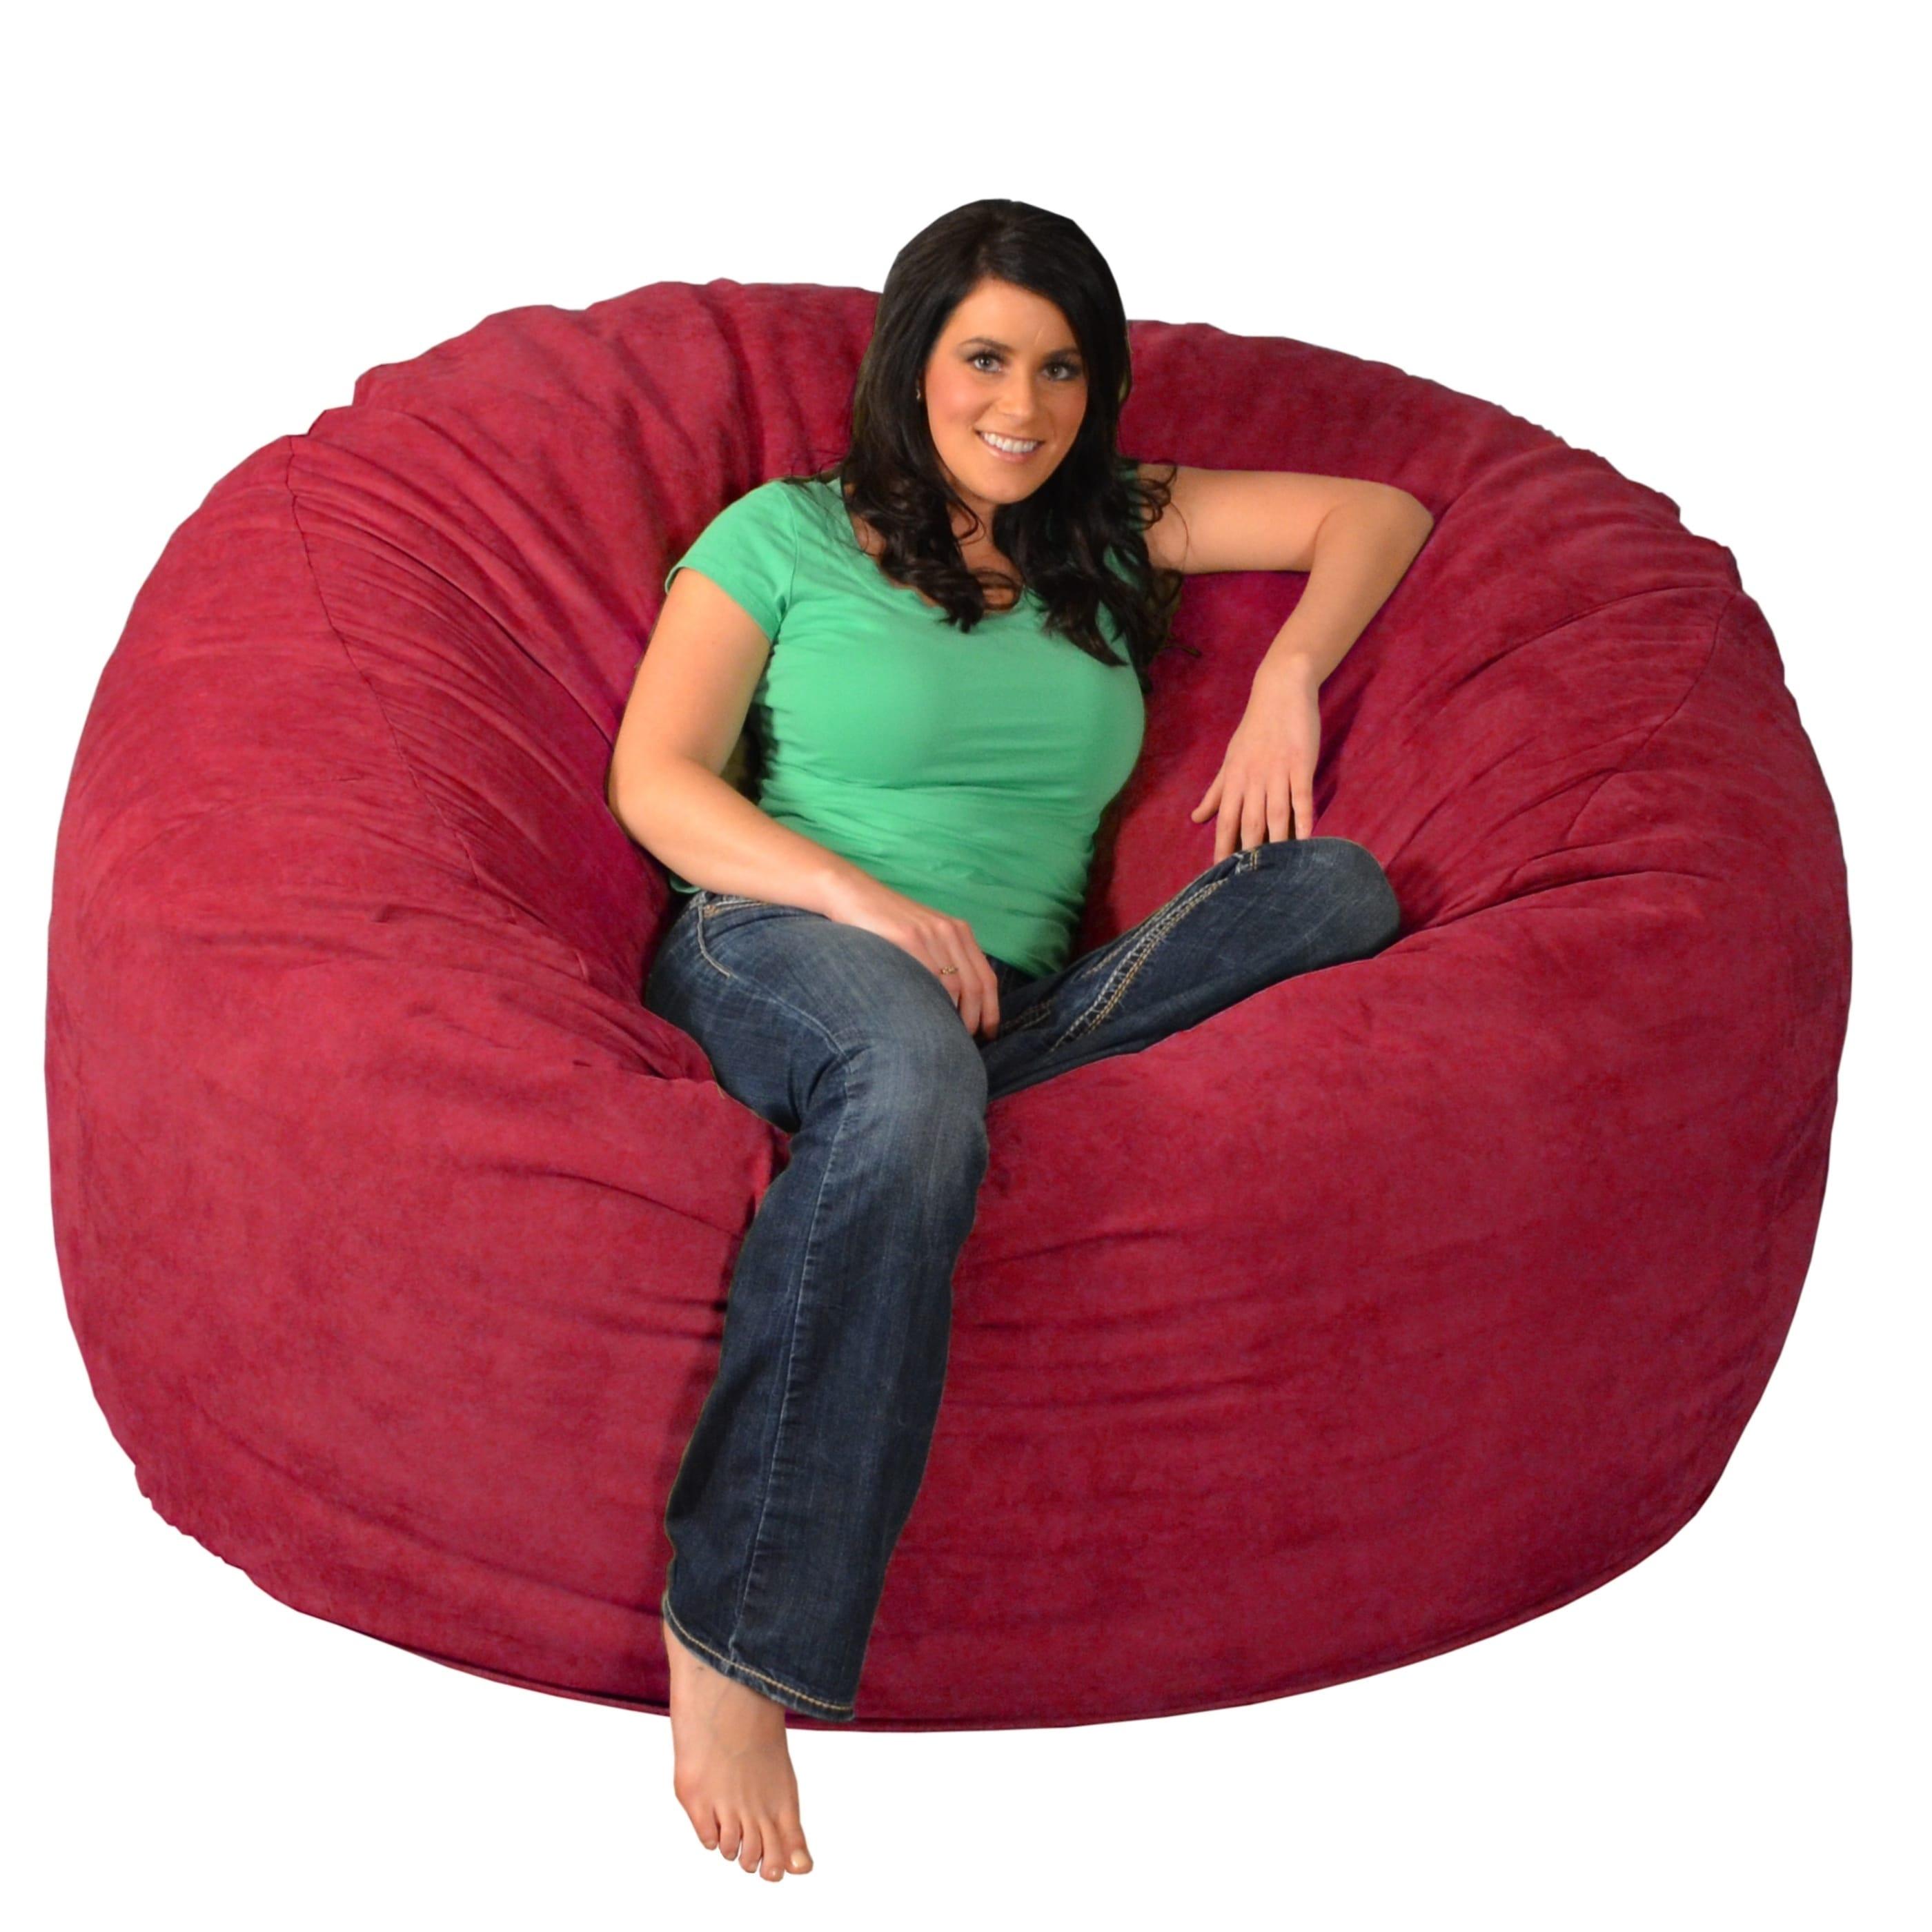 Beau Shop Giant Memory Foam Bean Bag 6 Foot Chair   Free Shipping Today    Overstock.com   9936912